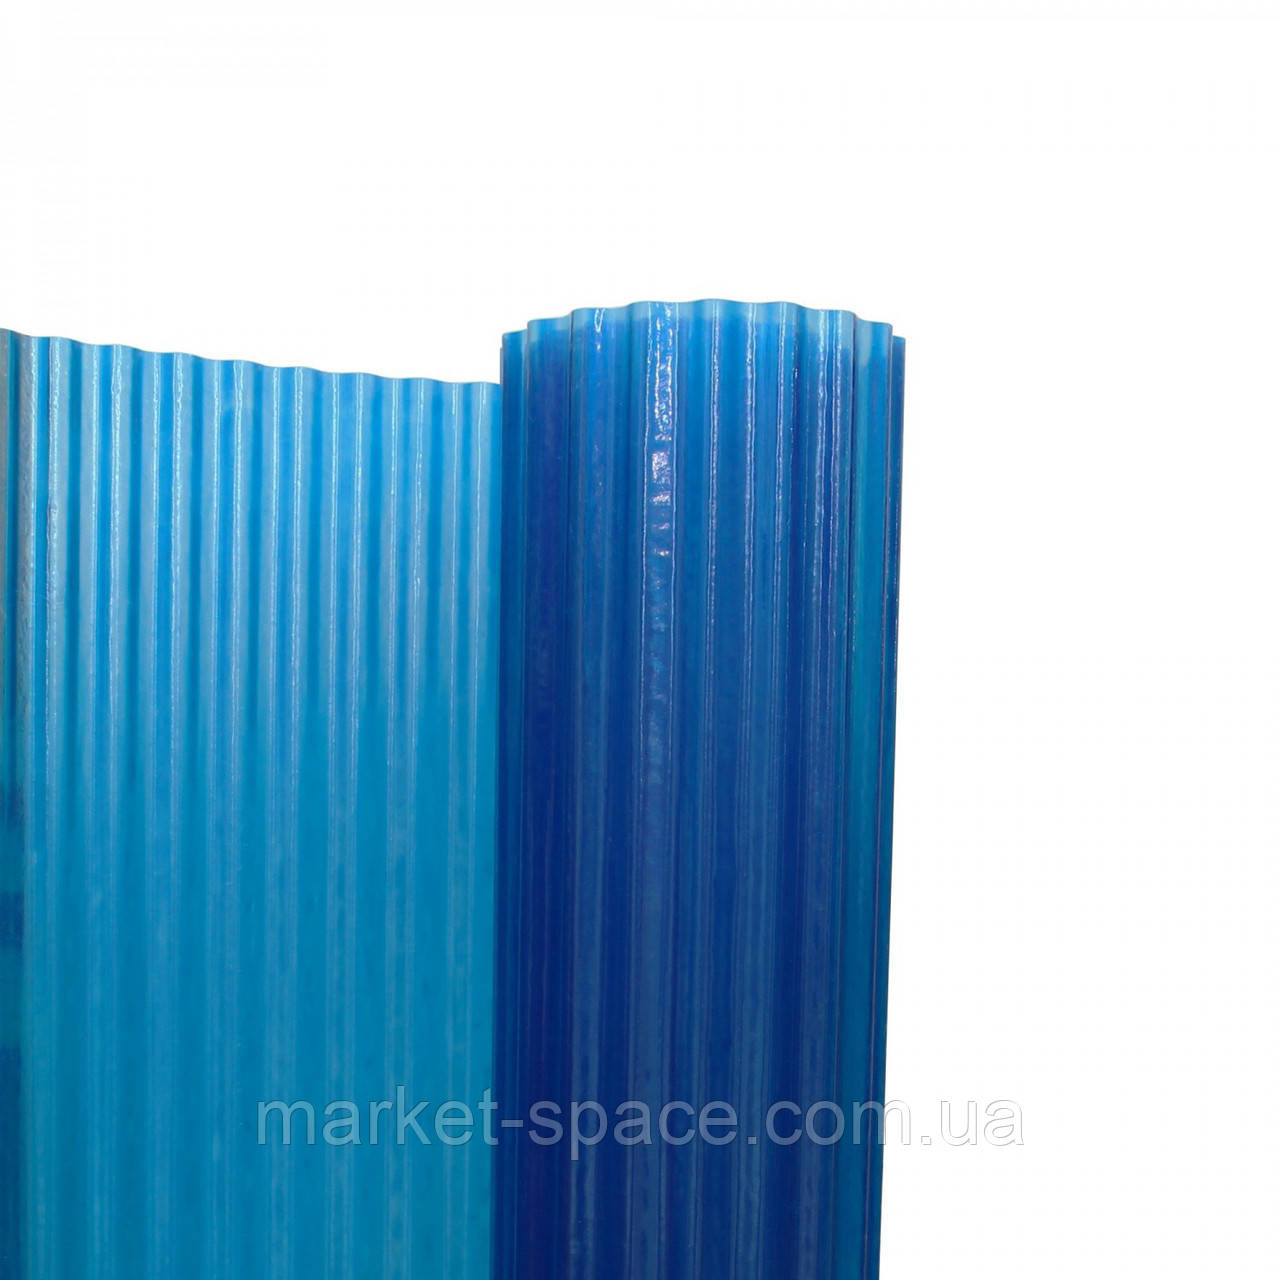 "Пластиковый шифер ""Волнопласт"". Цвет: синий. Размер рулона: Д:21м*Ш:2,5м=52.5 кв.м"